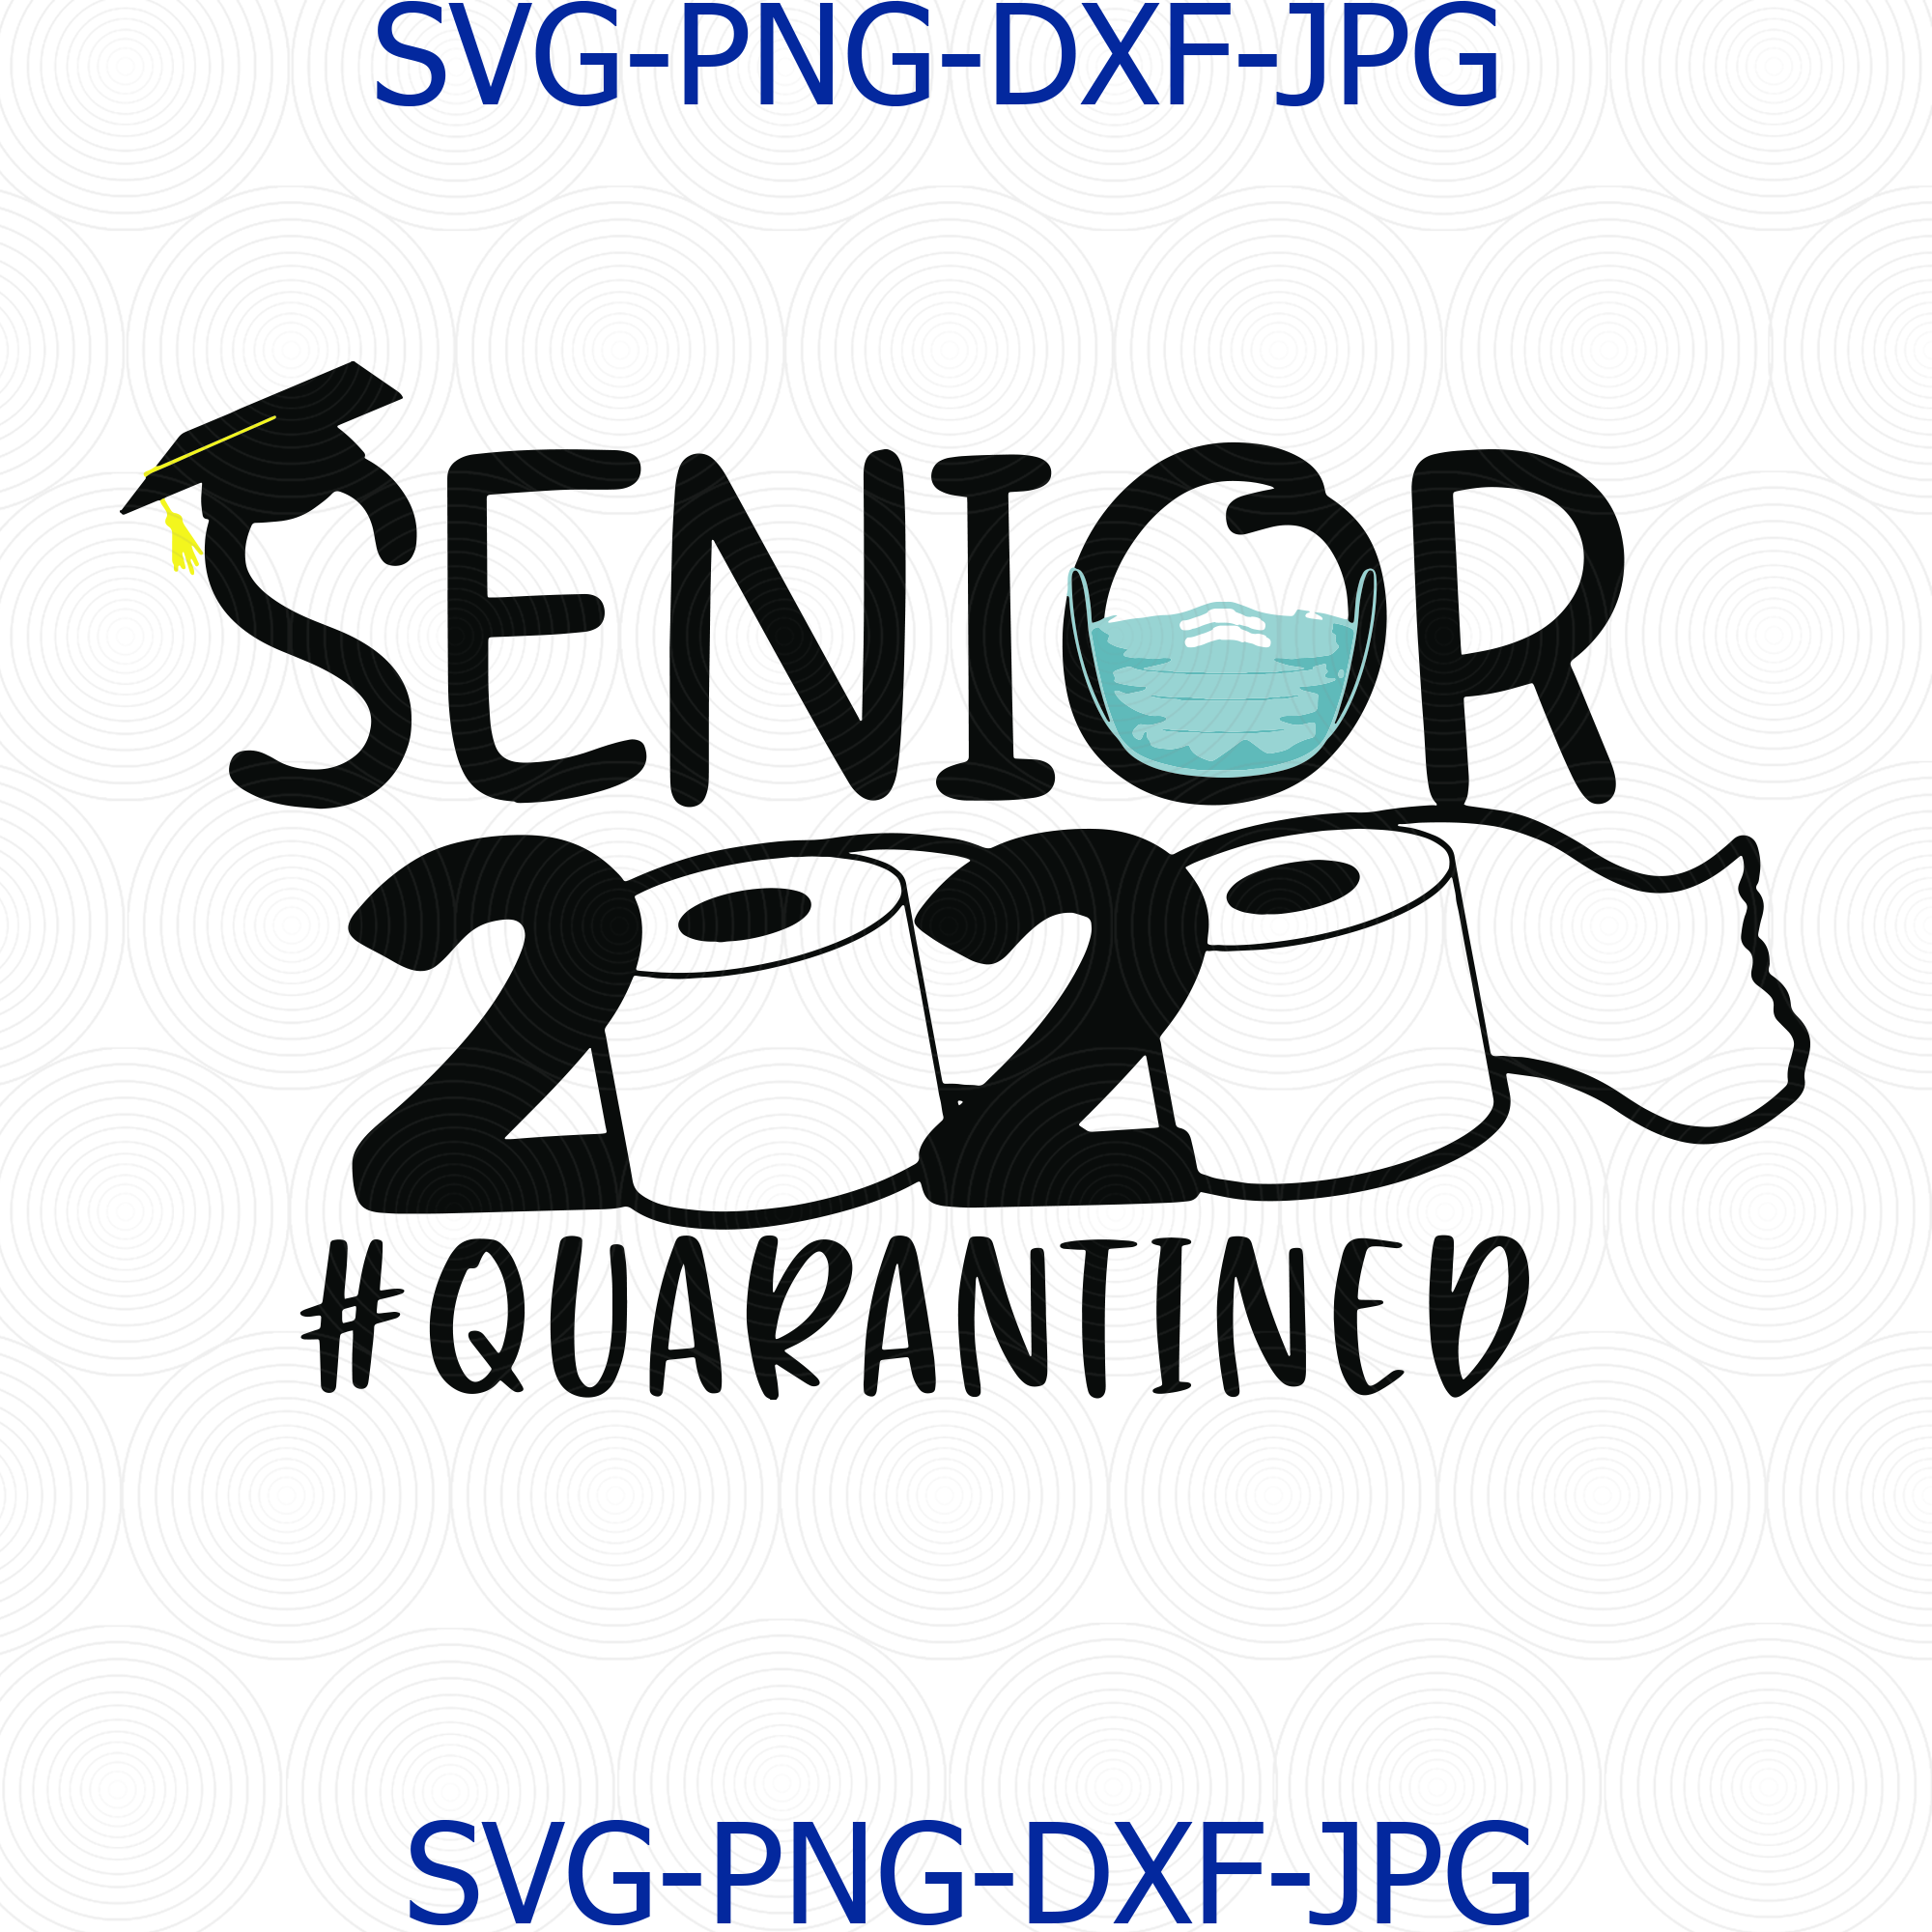 Senior 2020 Quarantined Toilet Paper Mask By Digital4u On Zibbet